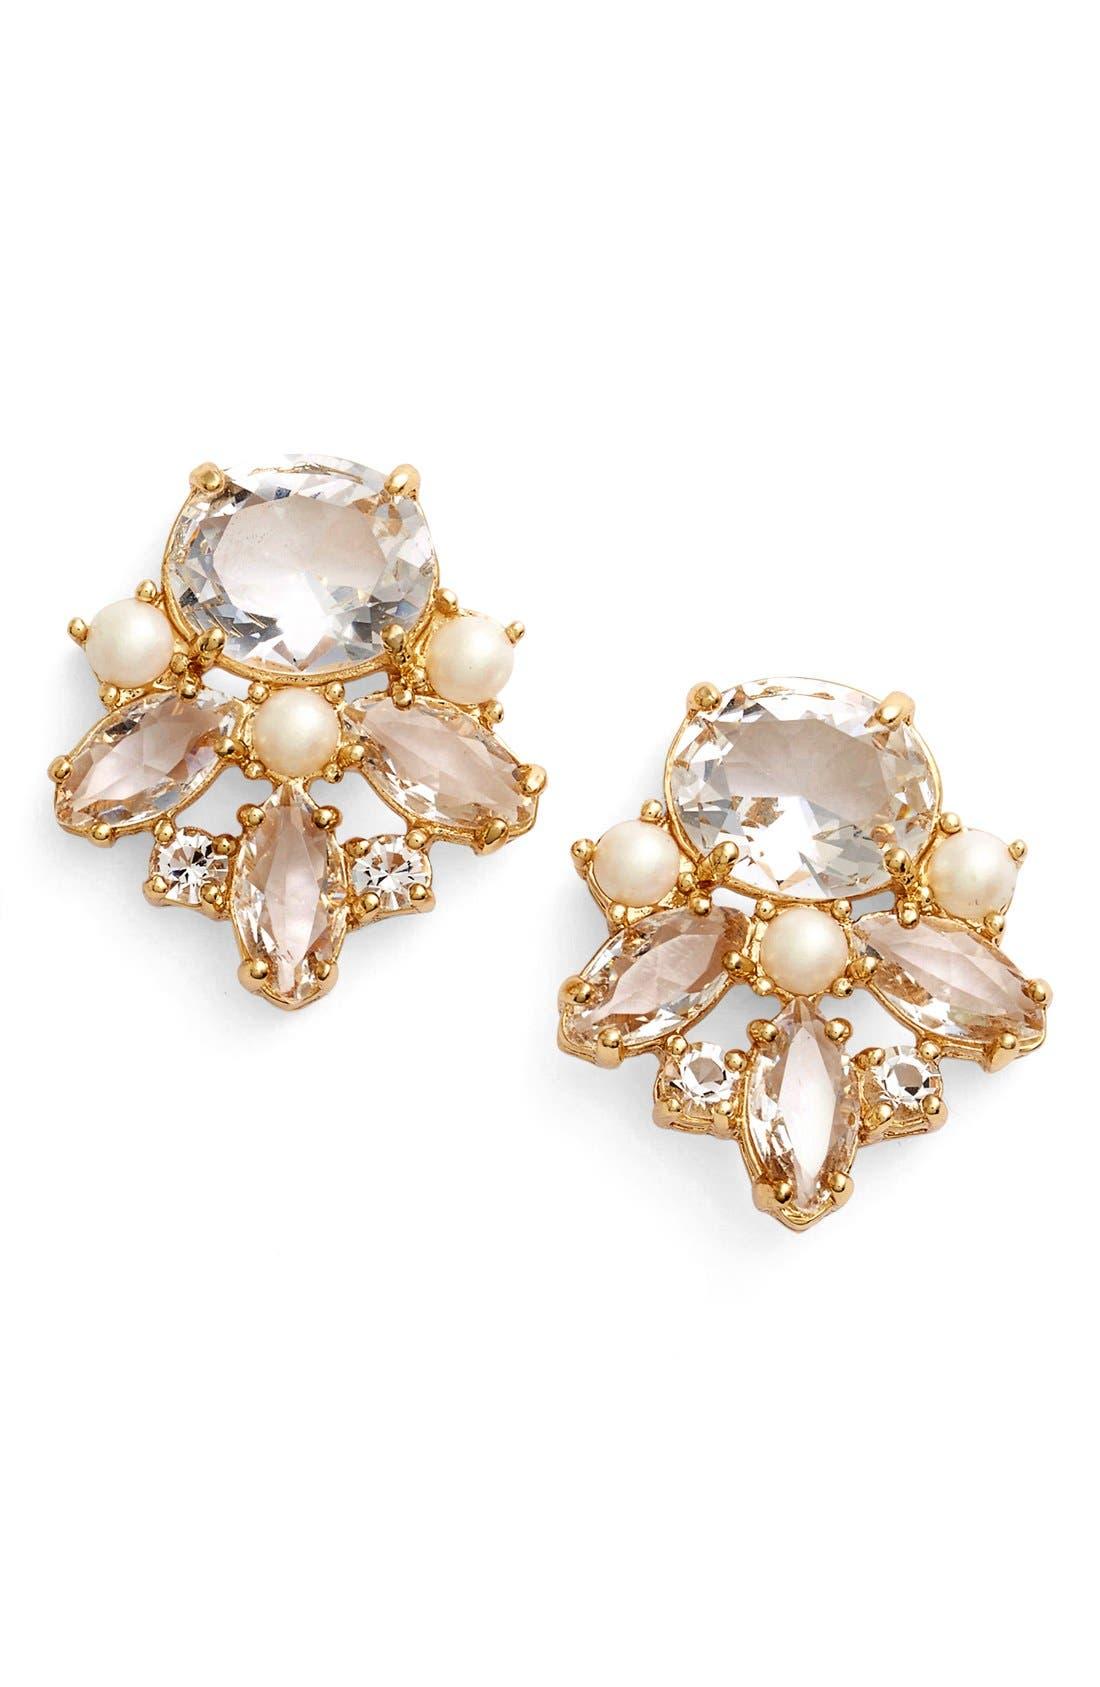 Alternate Image 1 Selected - kate spade new york 'chantilly' cluster stud earrings